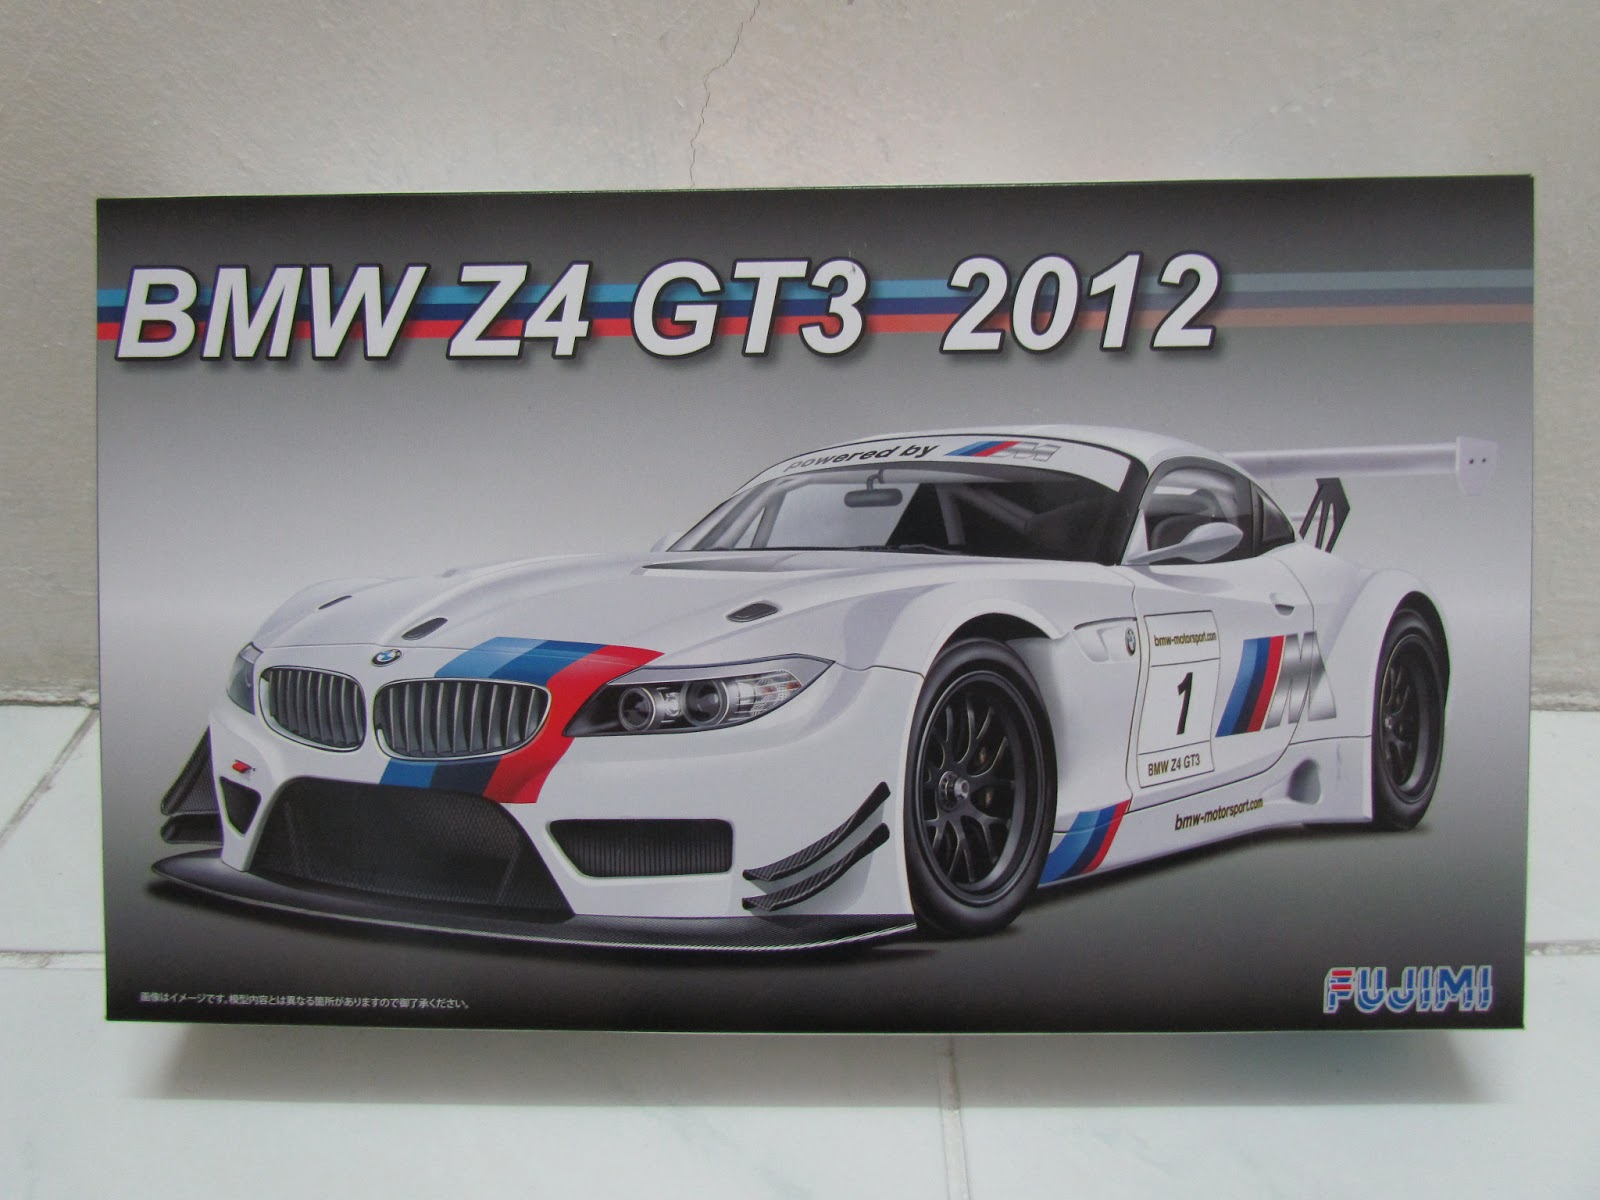 Mha Hobby For Sale Model Kit 1 24 Bmw Z4 Gt3 2012